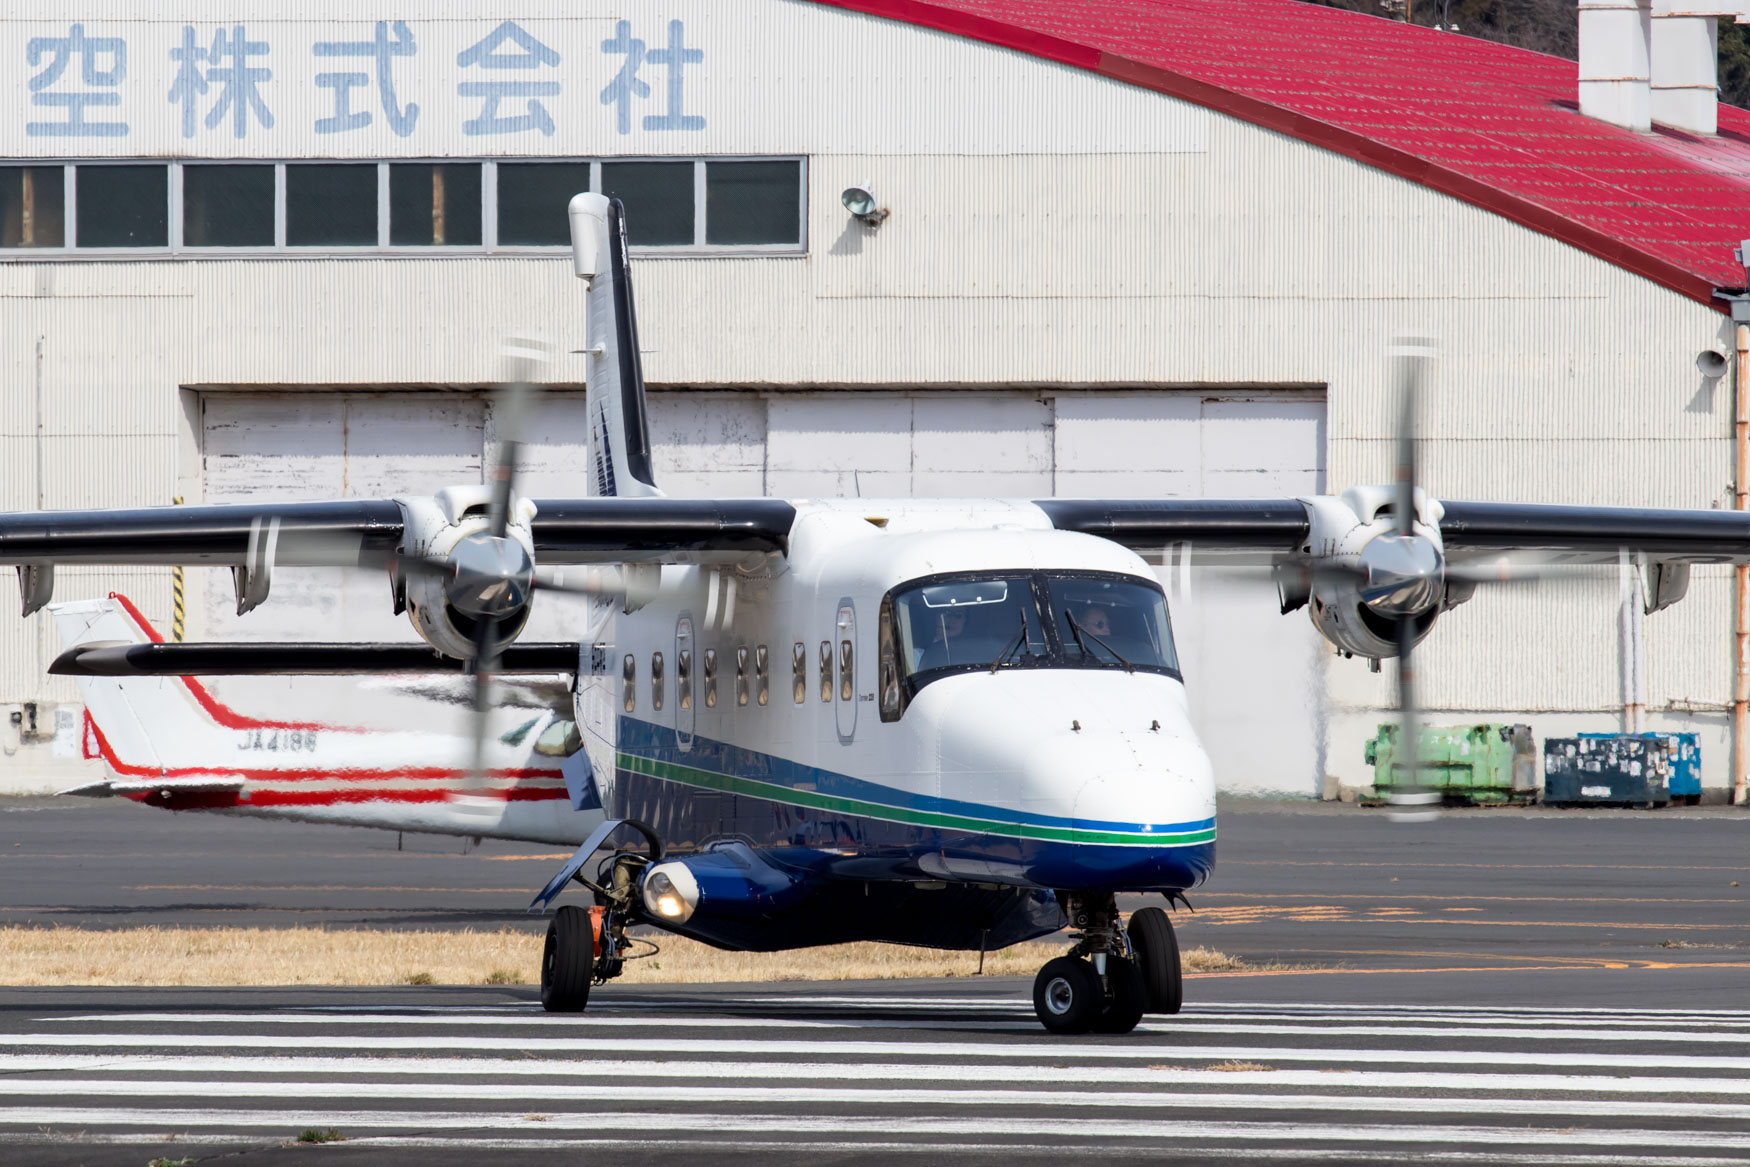 New Central Air Service Dornier Do-228